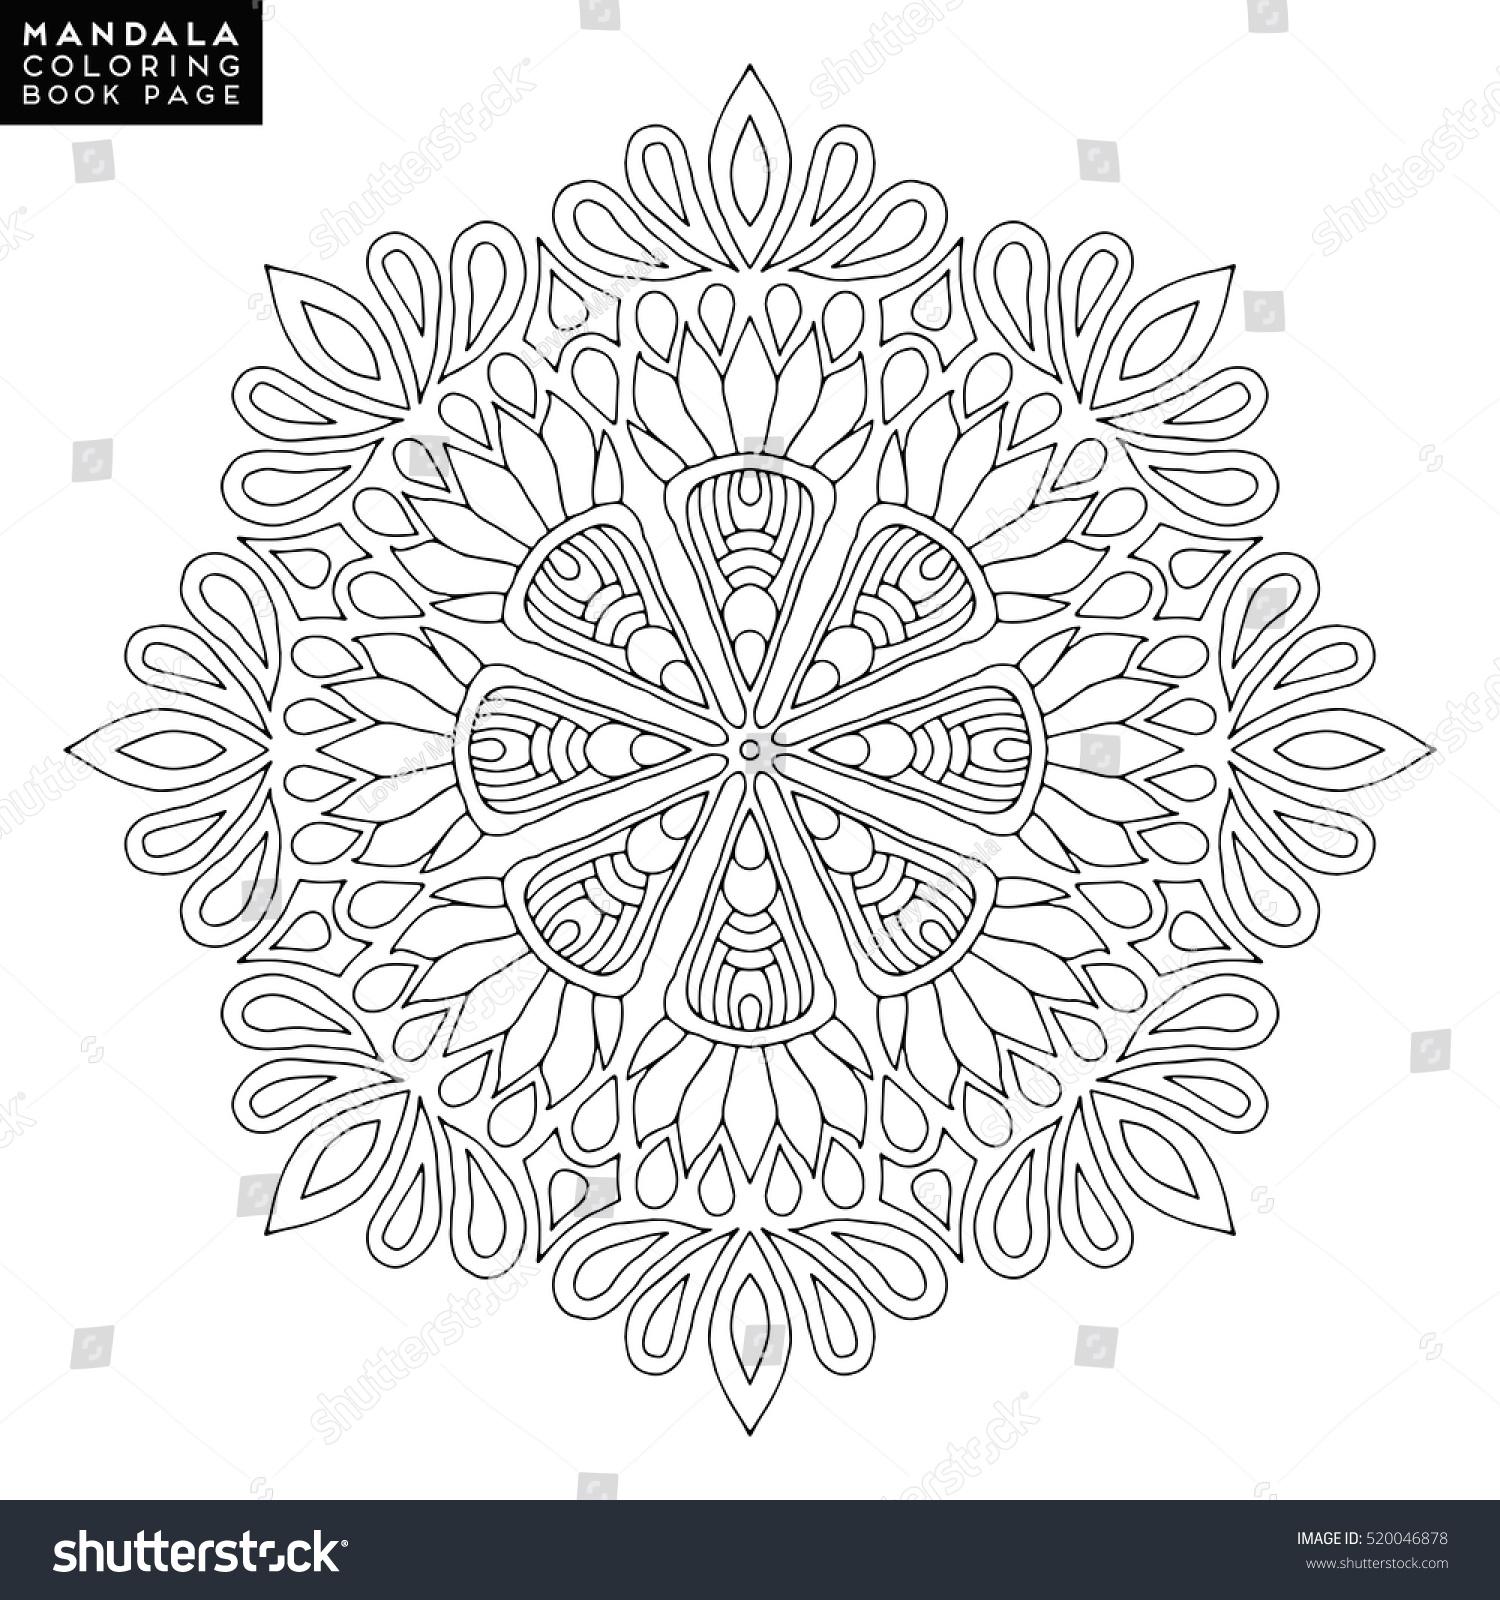 Co coloring book template - Wedding Coloring Book Template Mandala